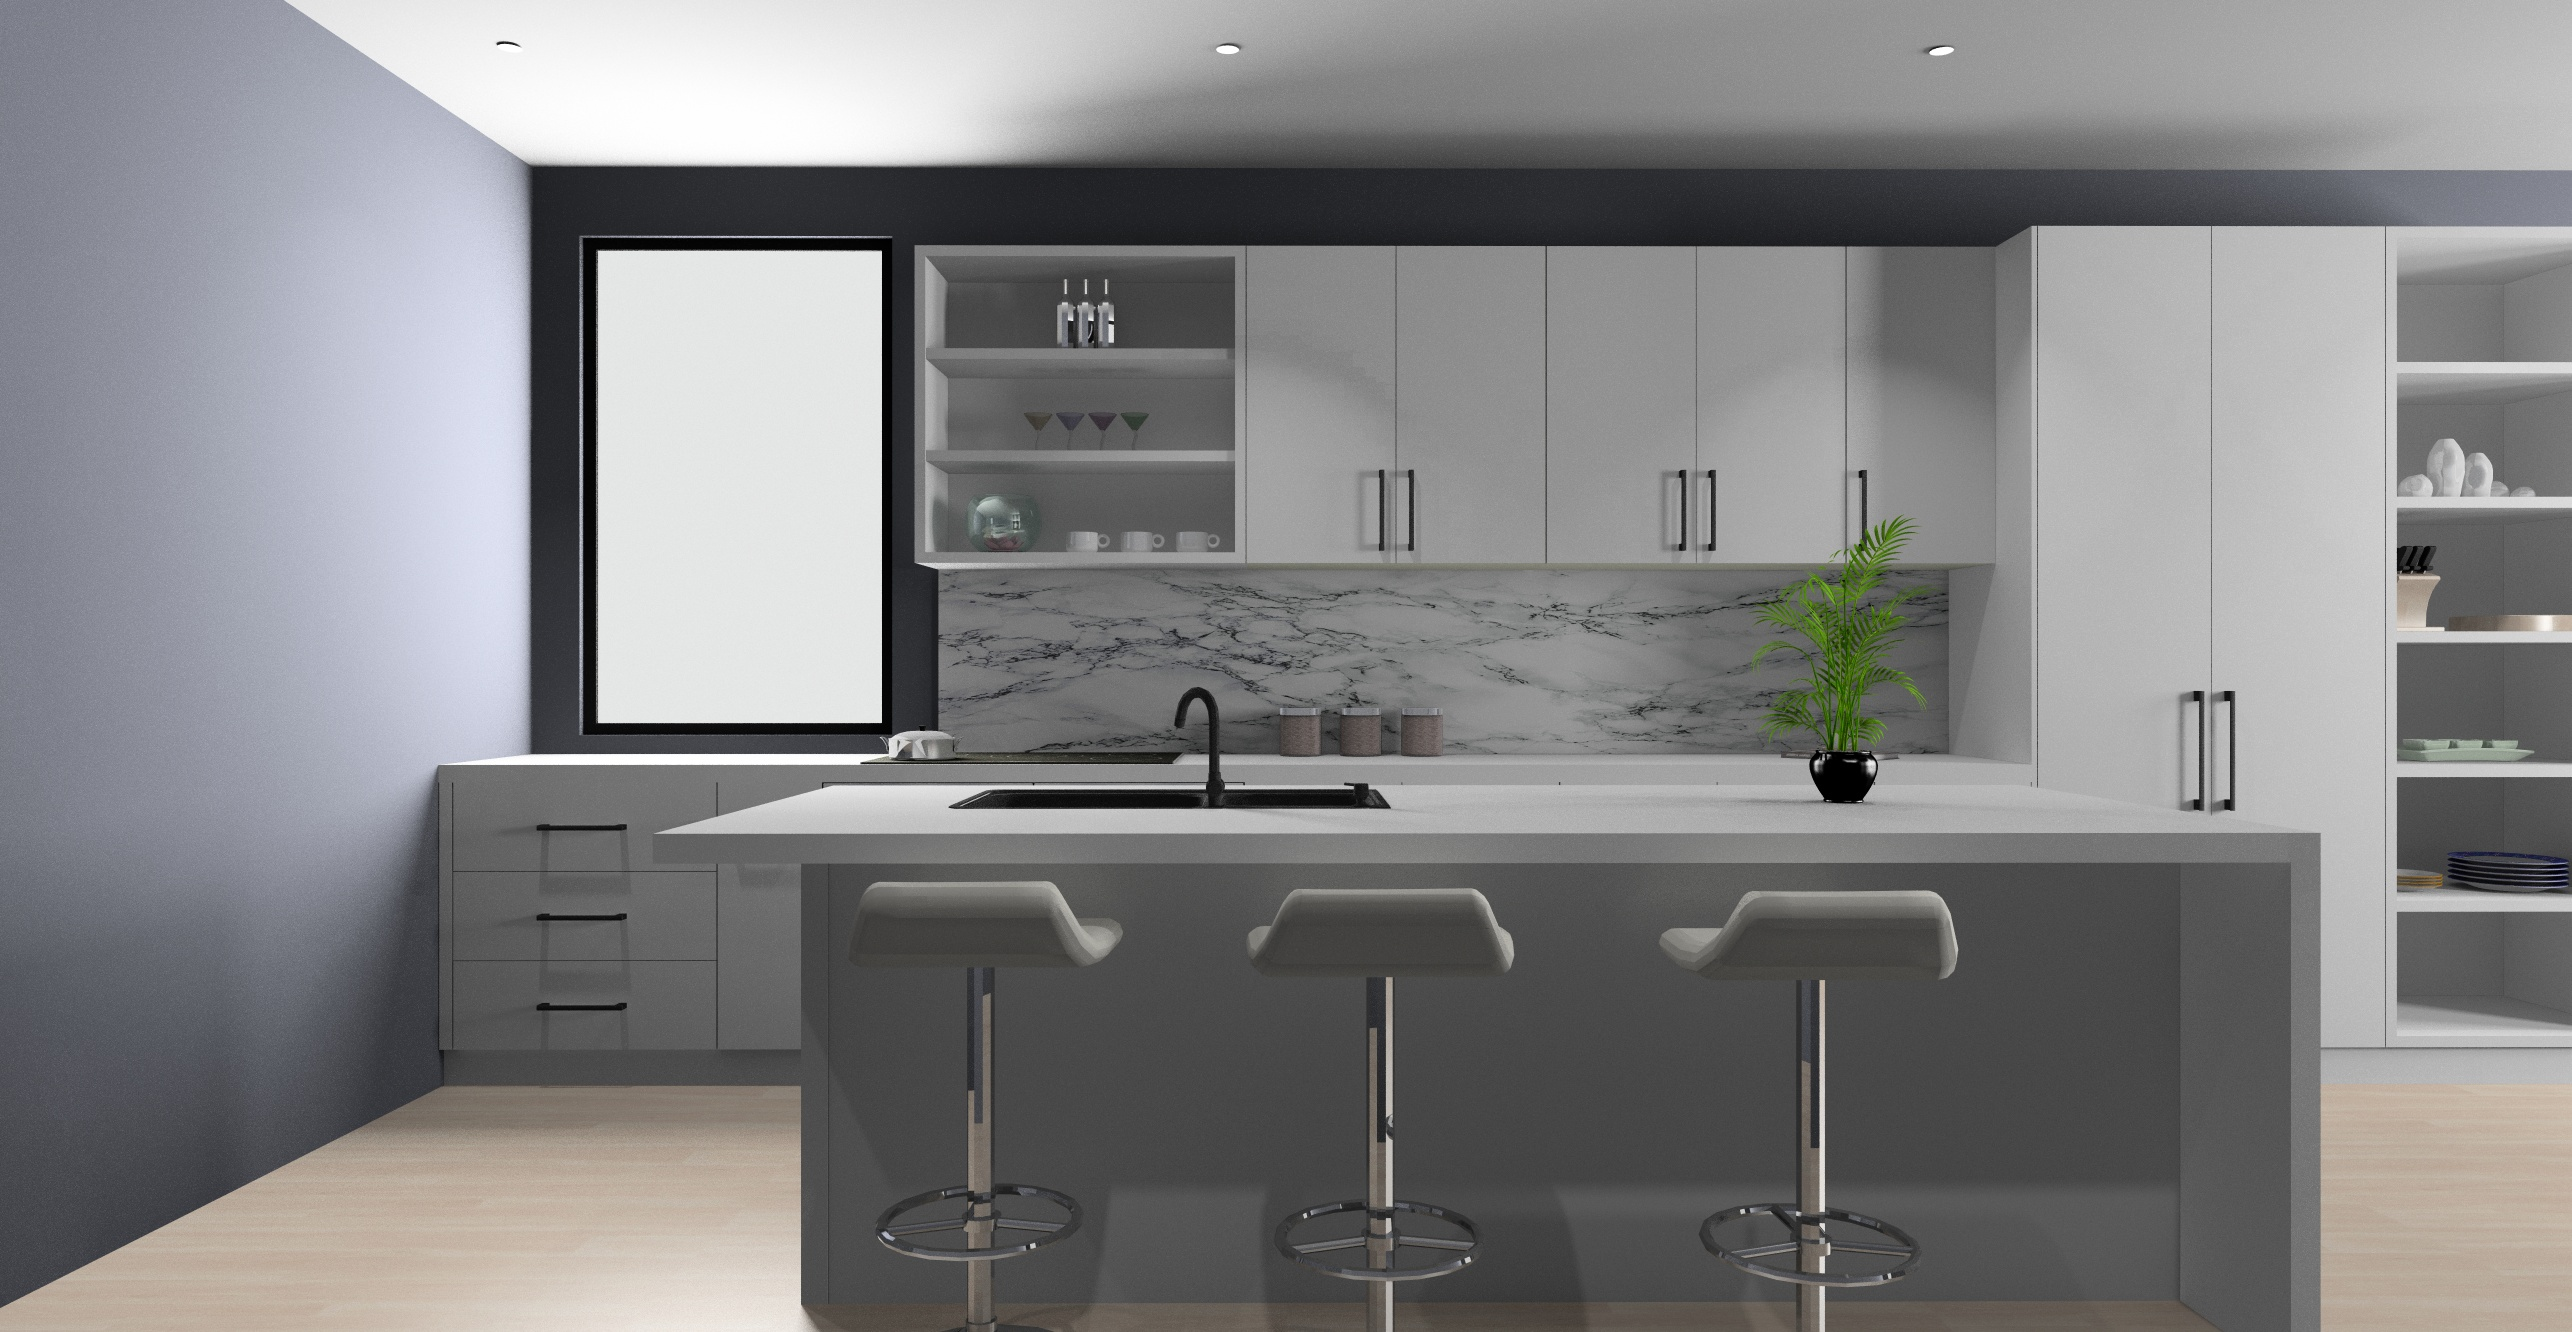 3D Design of a New Kitchen